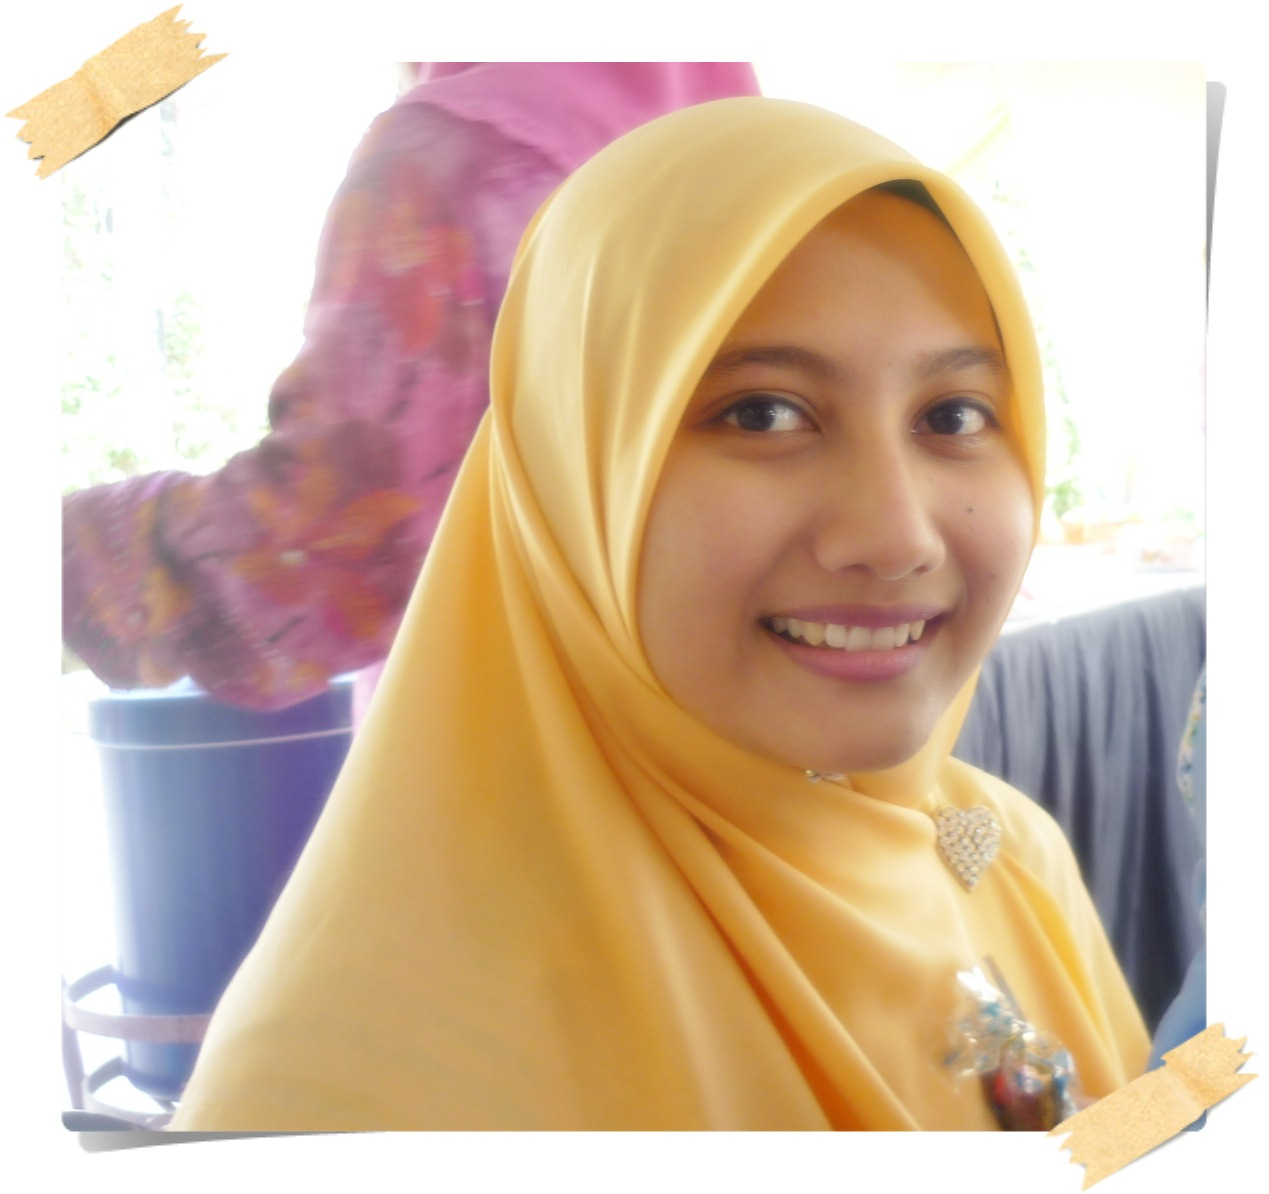 cabaran filem indie di malaysia Ayiff iktiraf penggiat seni filem indie mahasiswa universiti disarankan untuk menyahut revolusi yang berlaku itu sebagai satu cabaran di di malaysia terjalin.